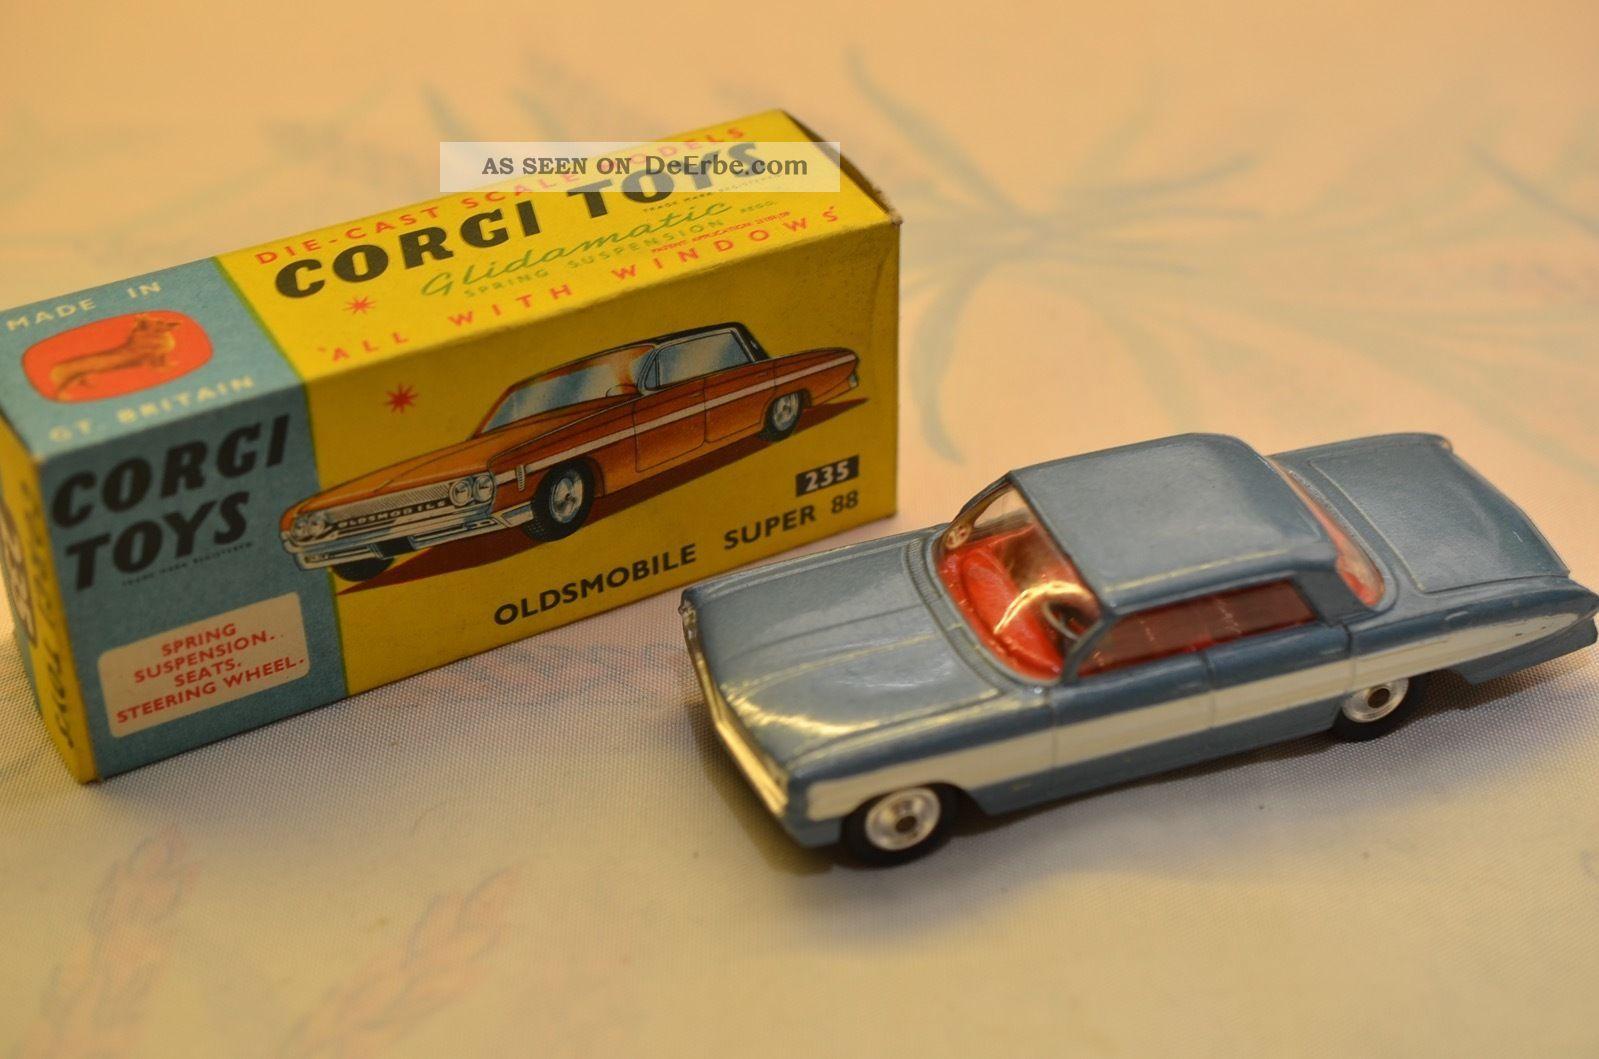 Sammlerstück Corgi Toys 235 Oldsmobile Supper 88 Fahrzeuge Bild